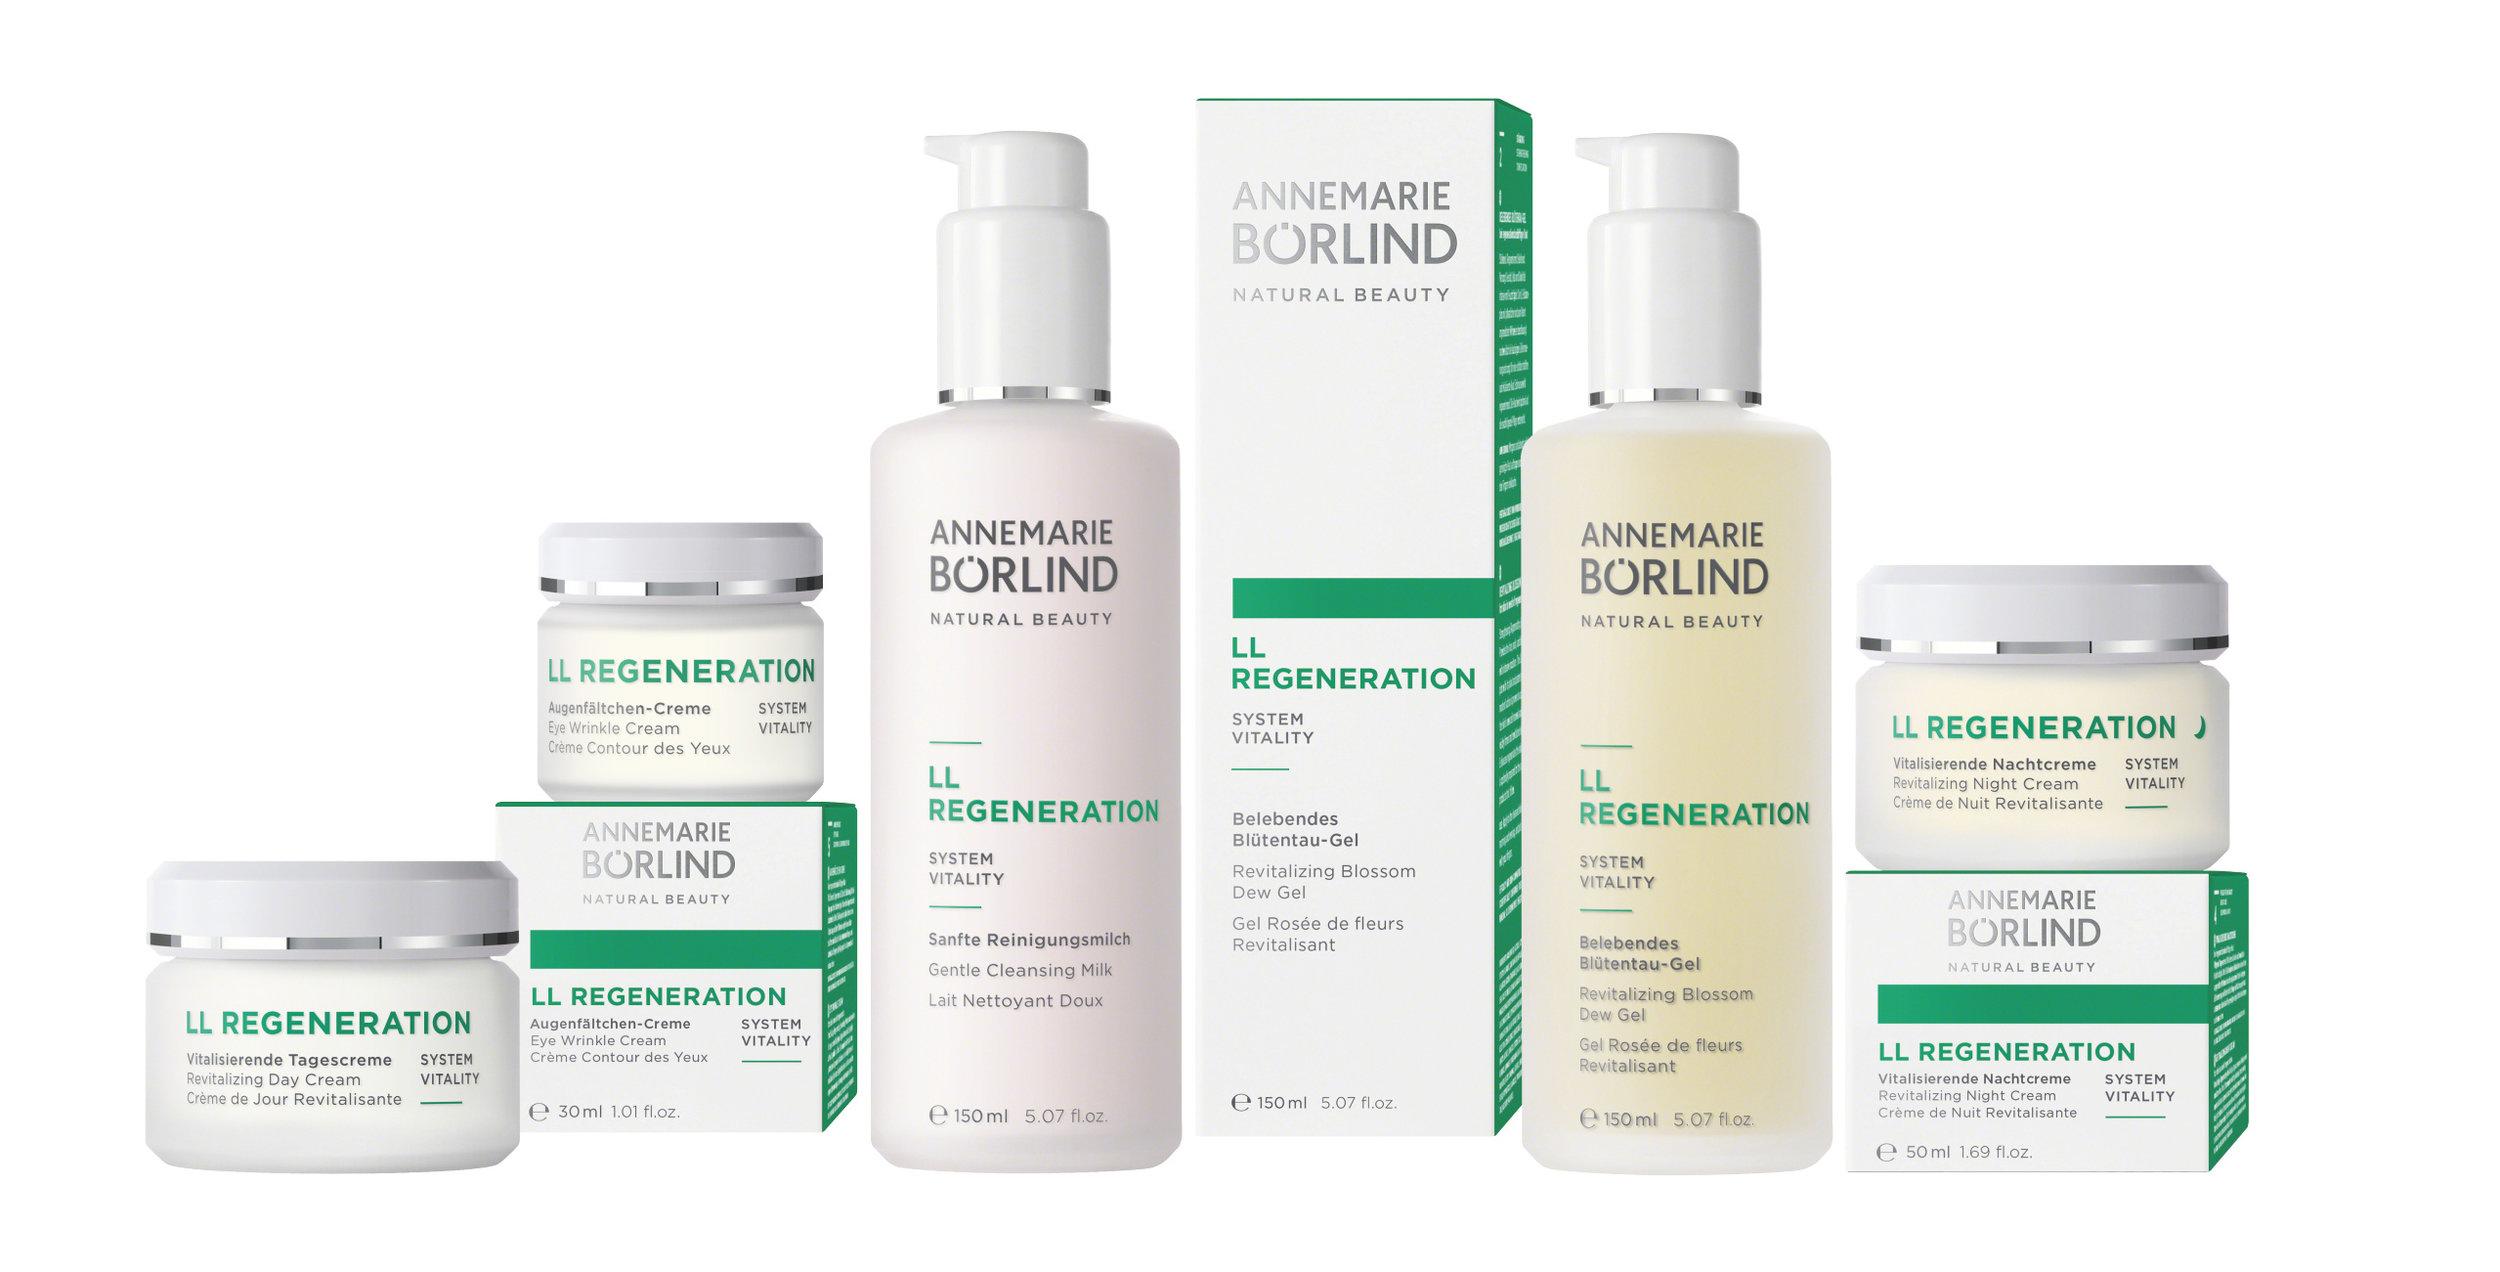 Annemarie Borlind LL regeneration collection